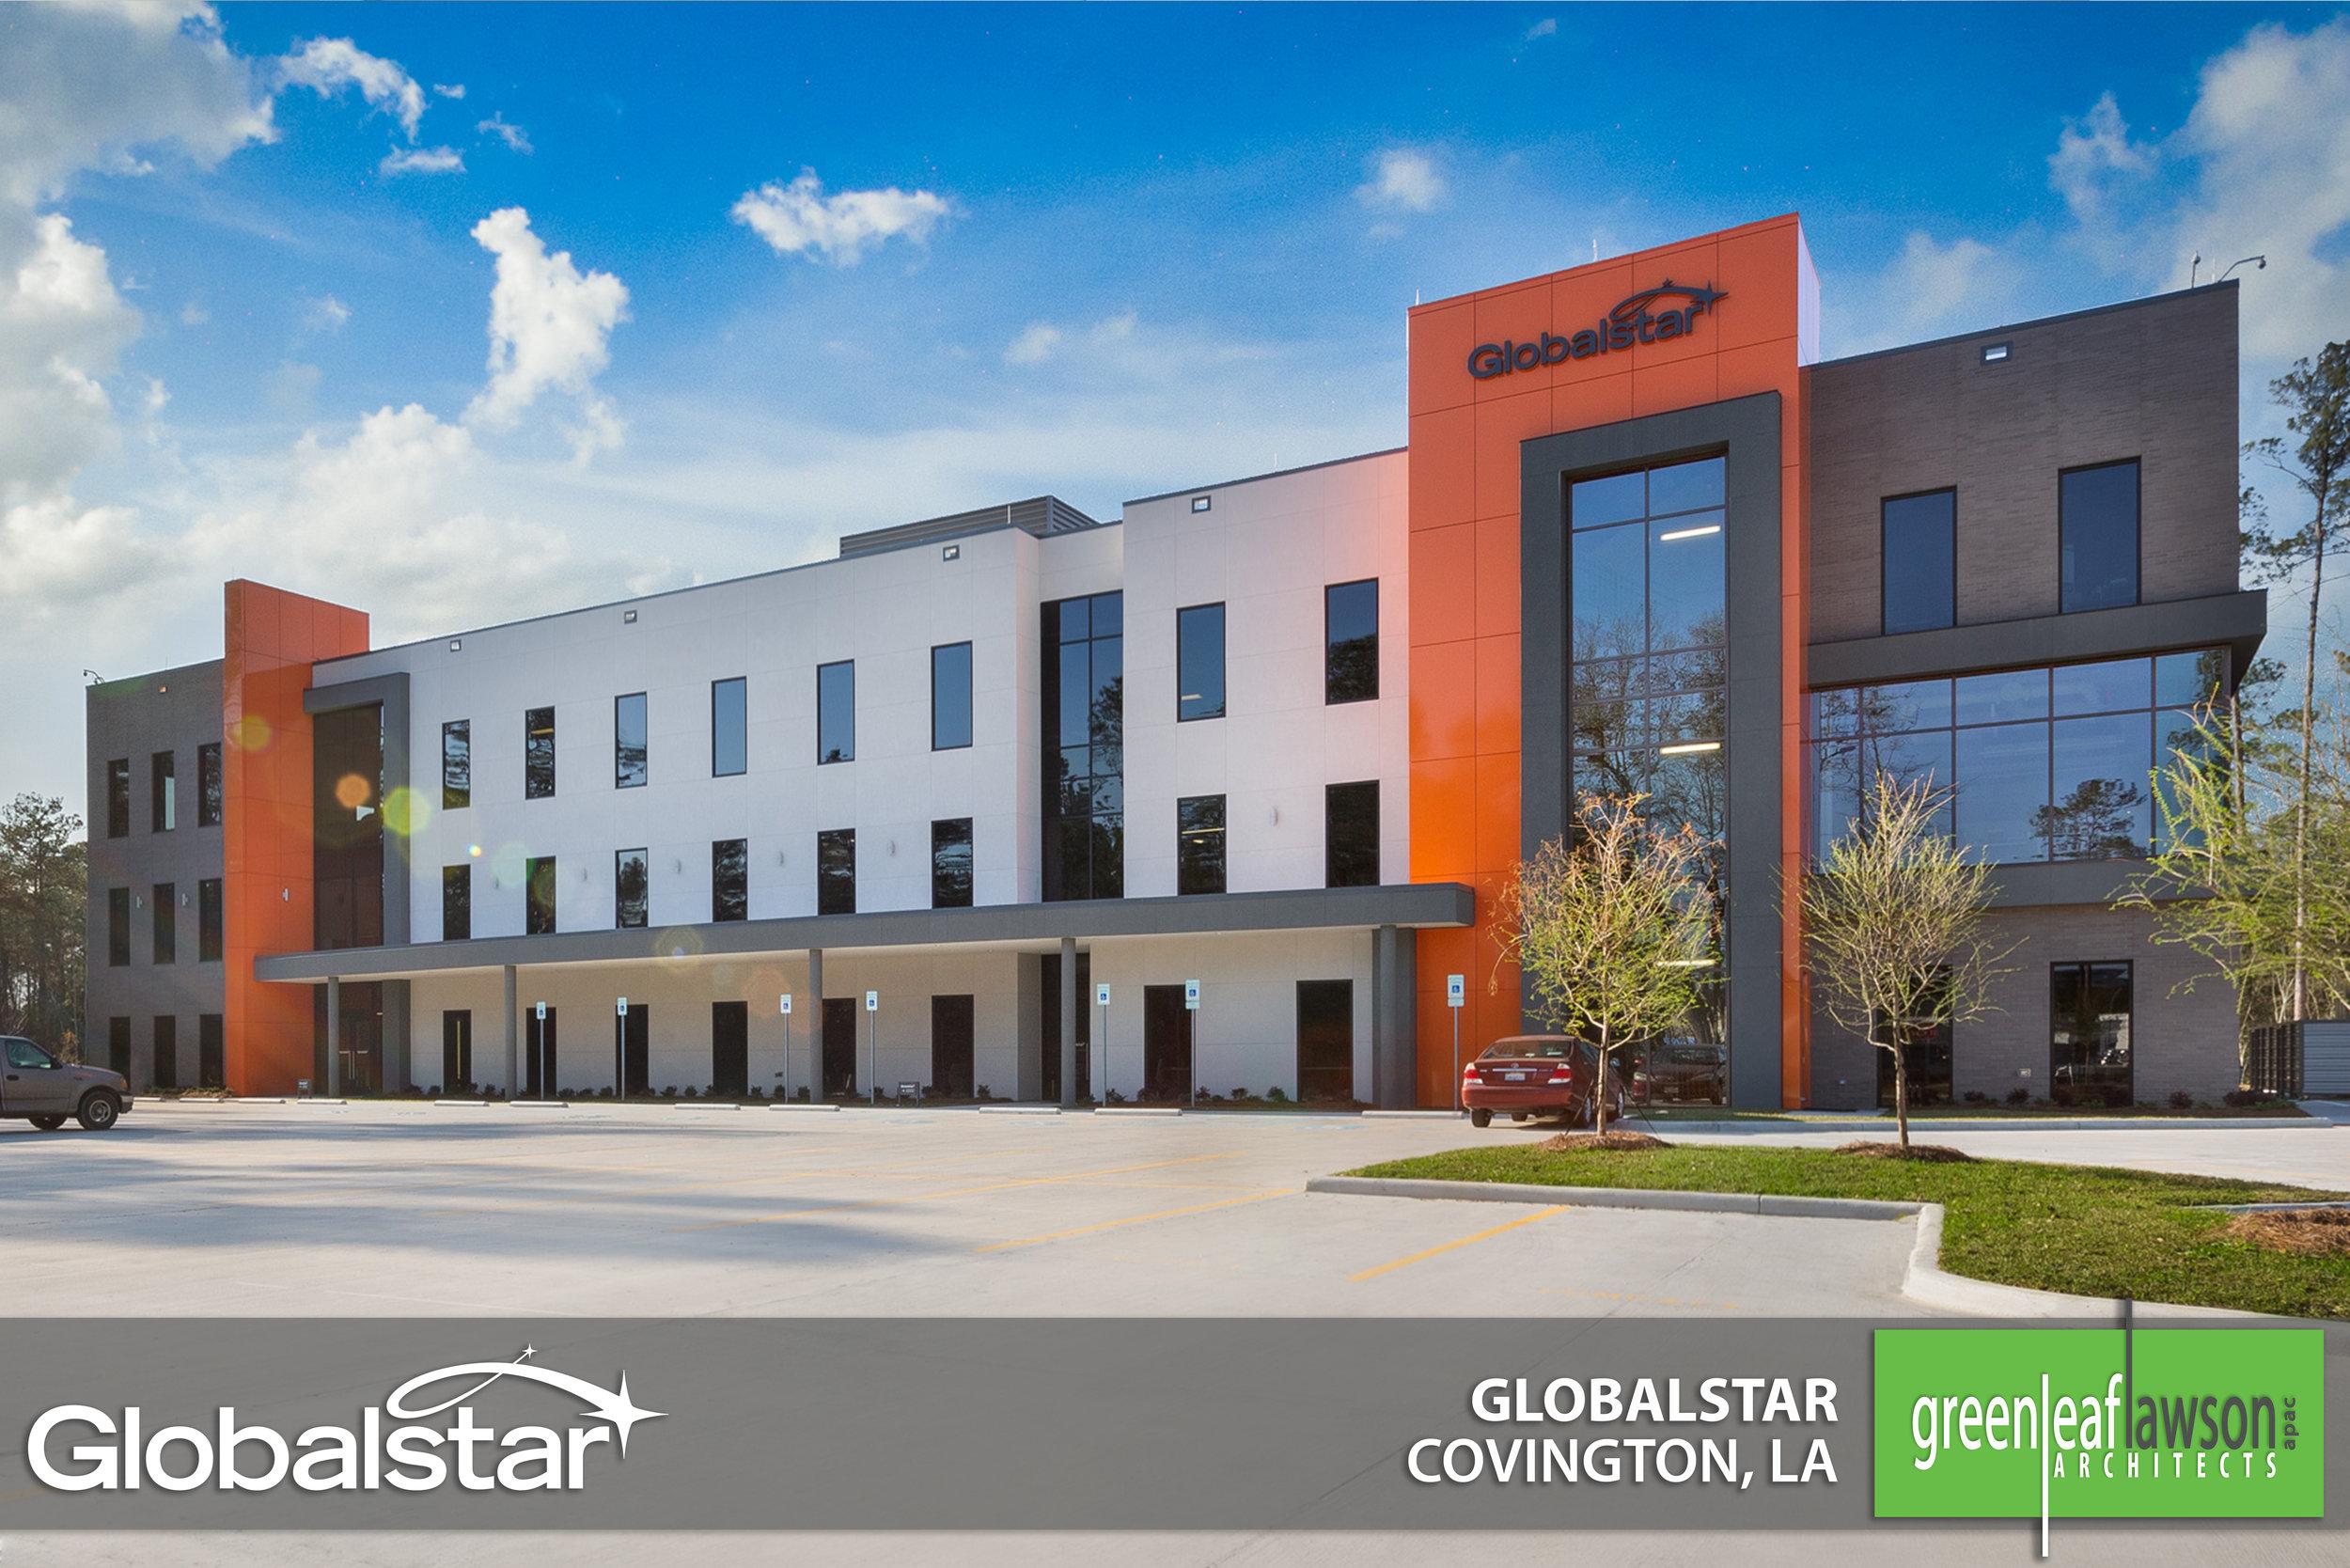 Globalstar 4.jpg